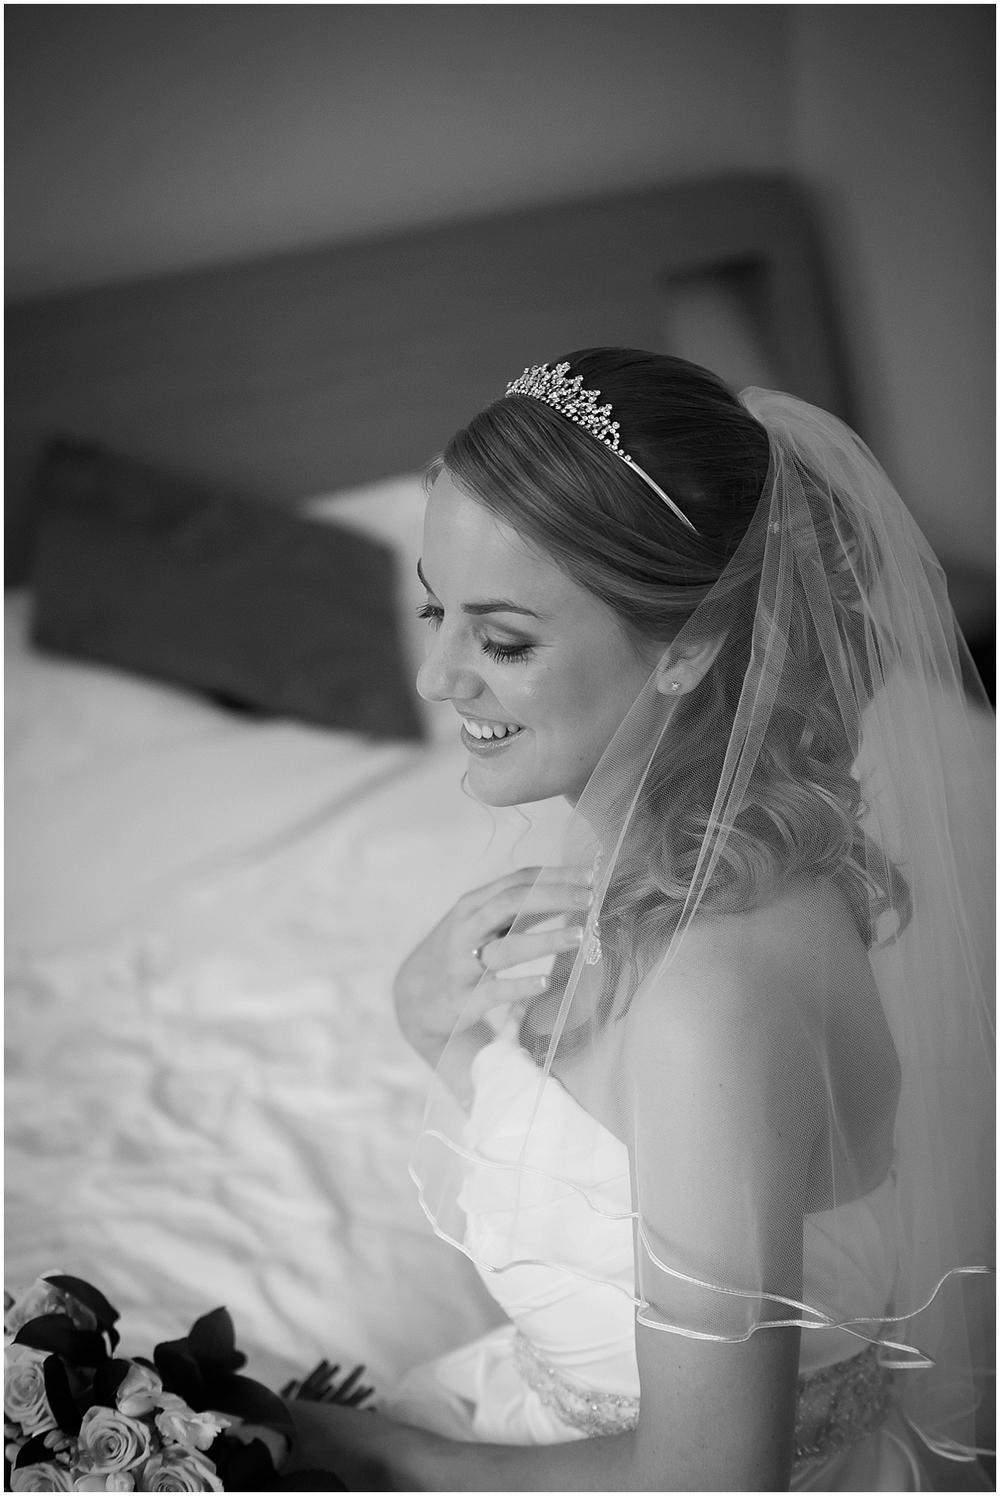 Jon-Cripwell-Sheffield-Wedding-Photography_0011.jpg